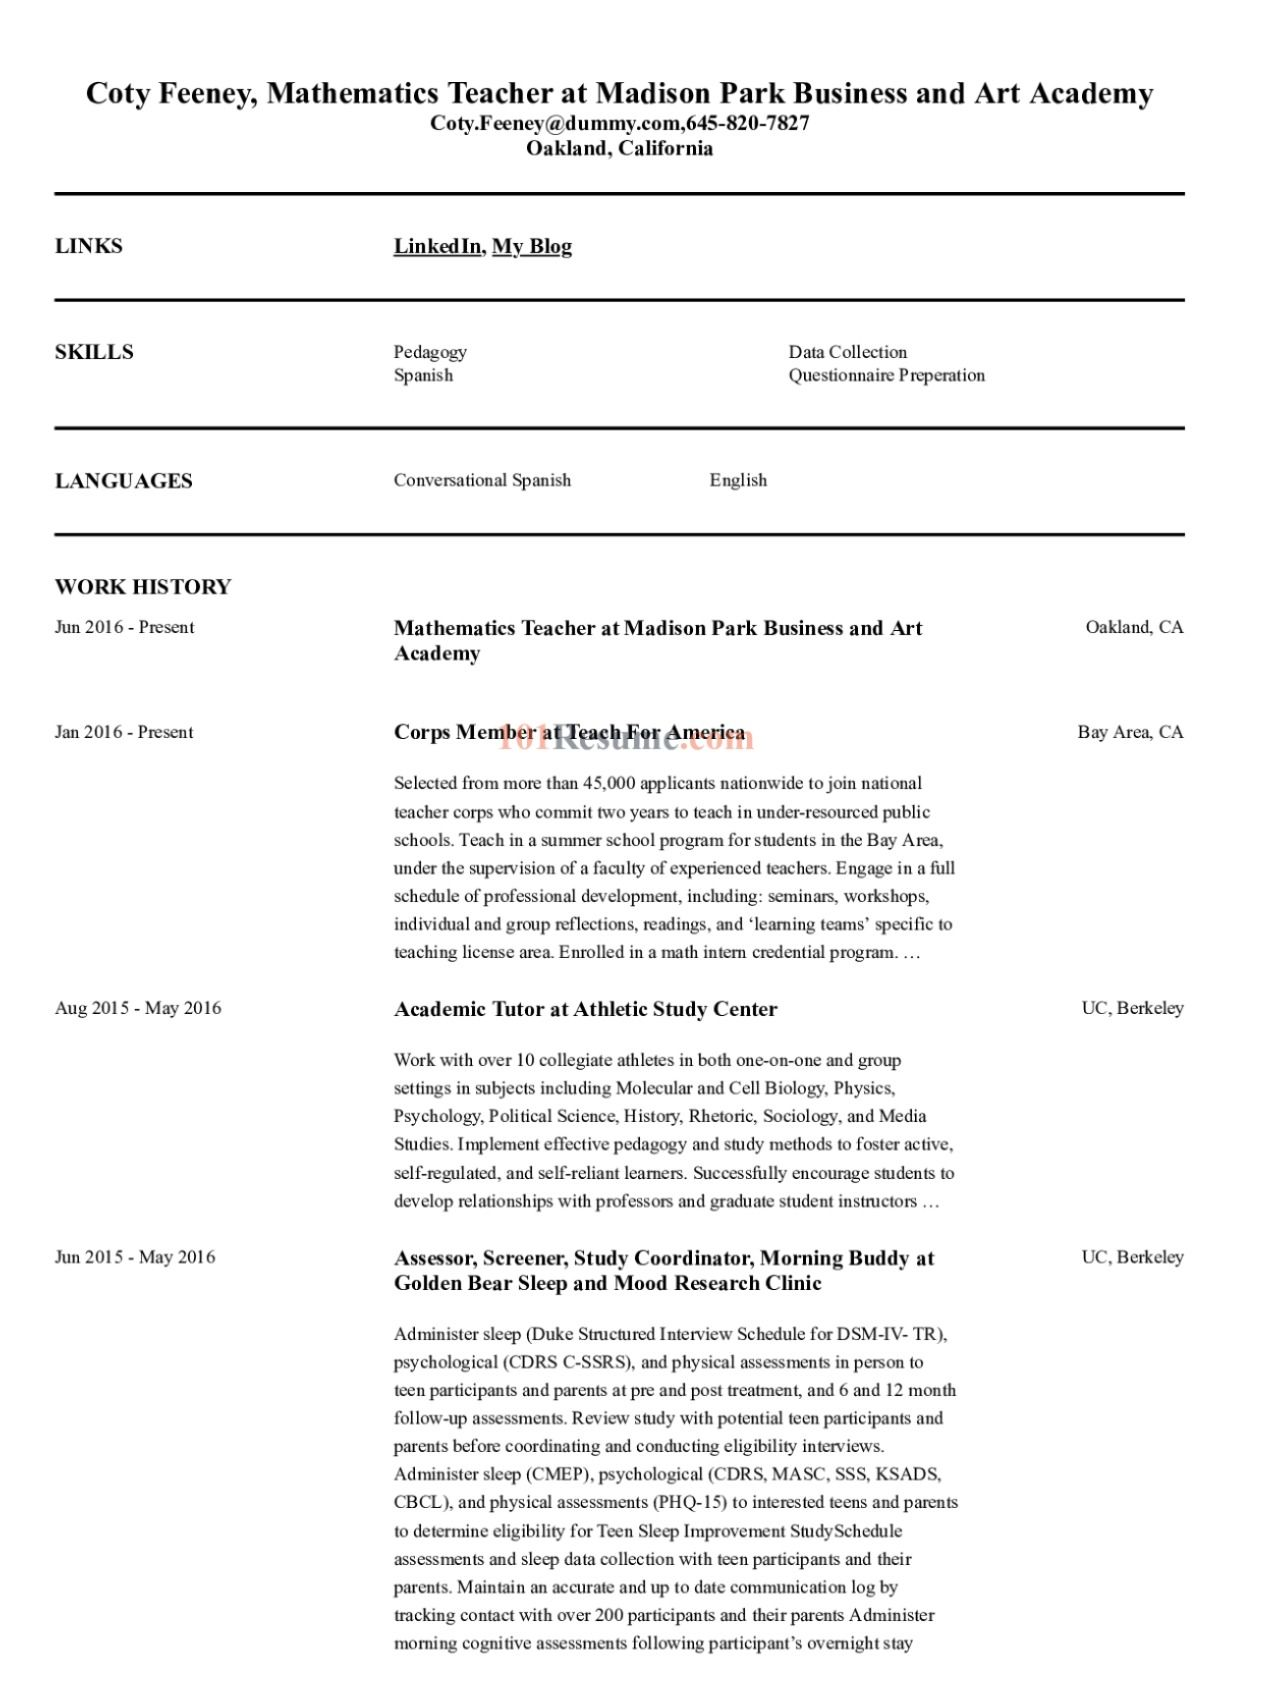 High School Mathematics Teacher resume sample in 2020